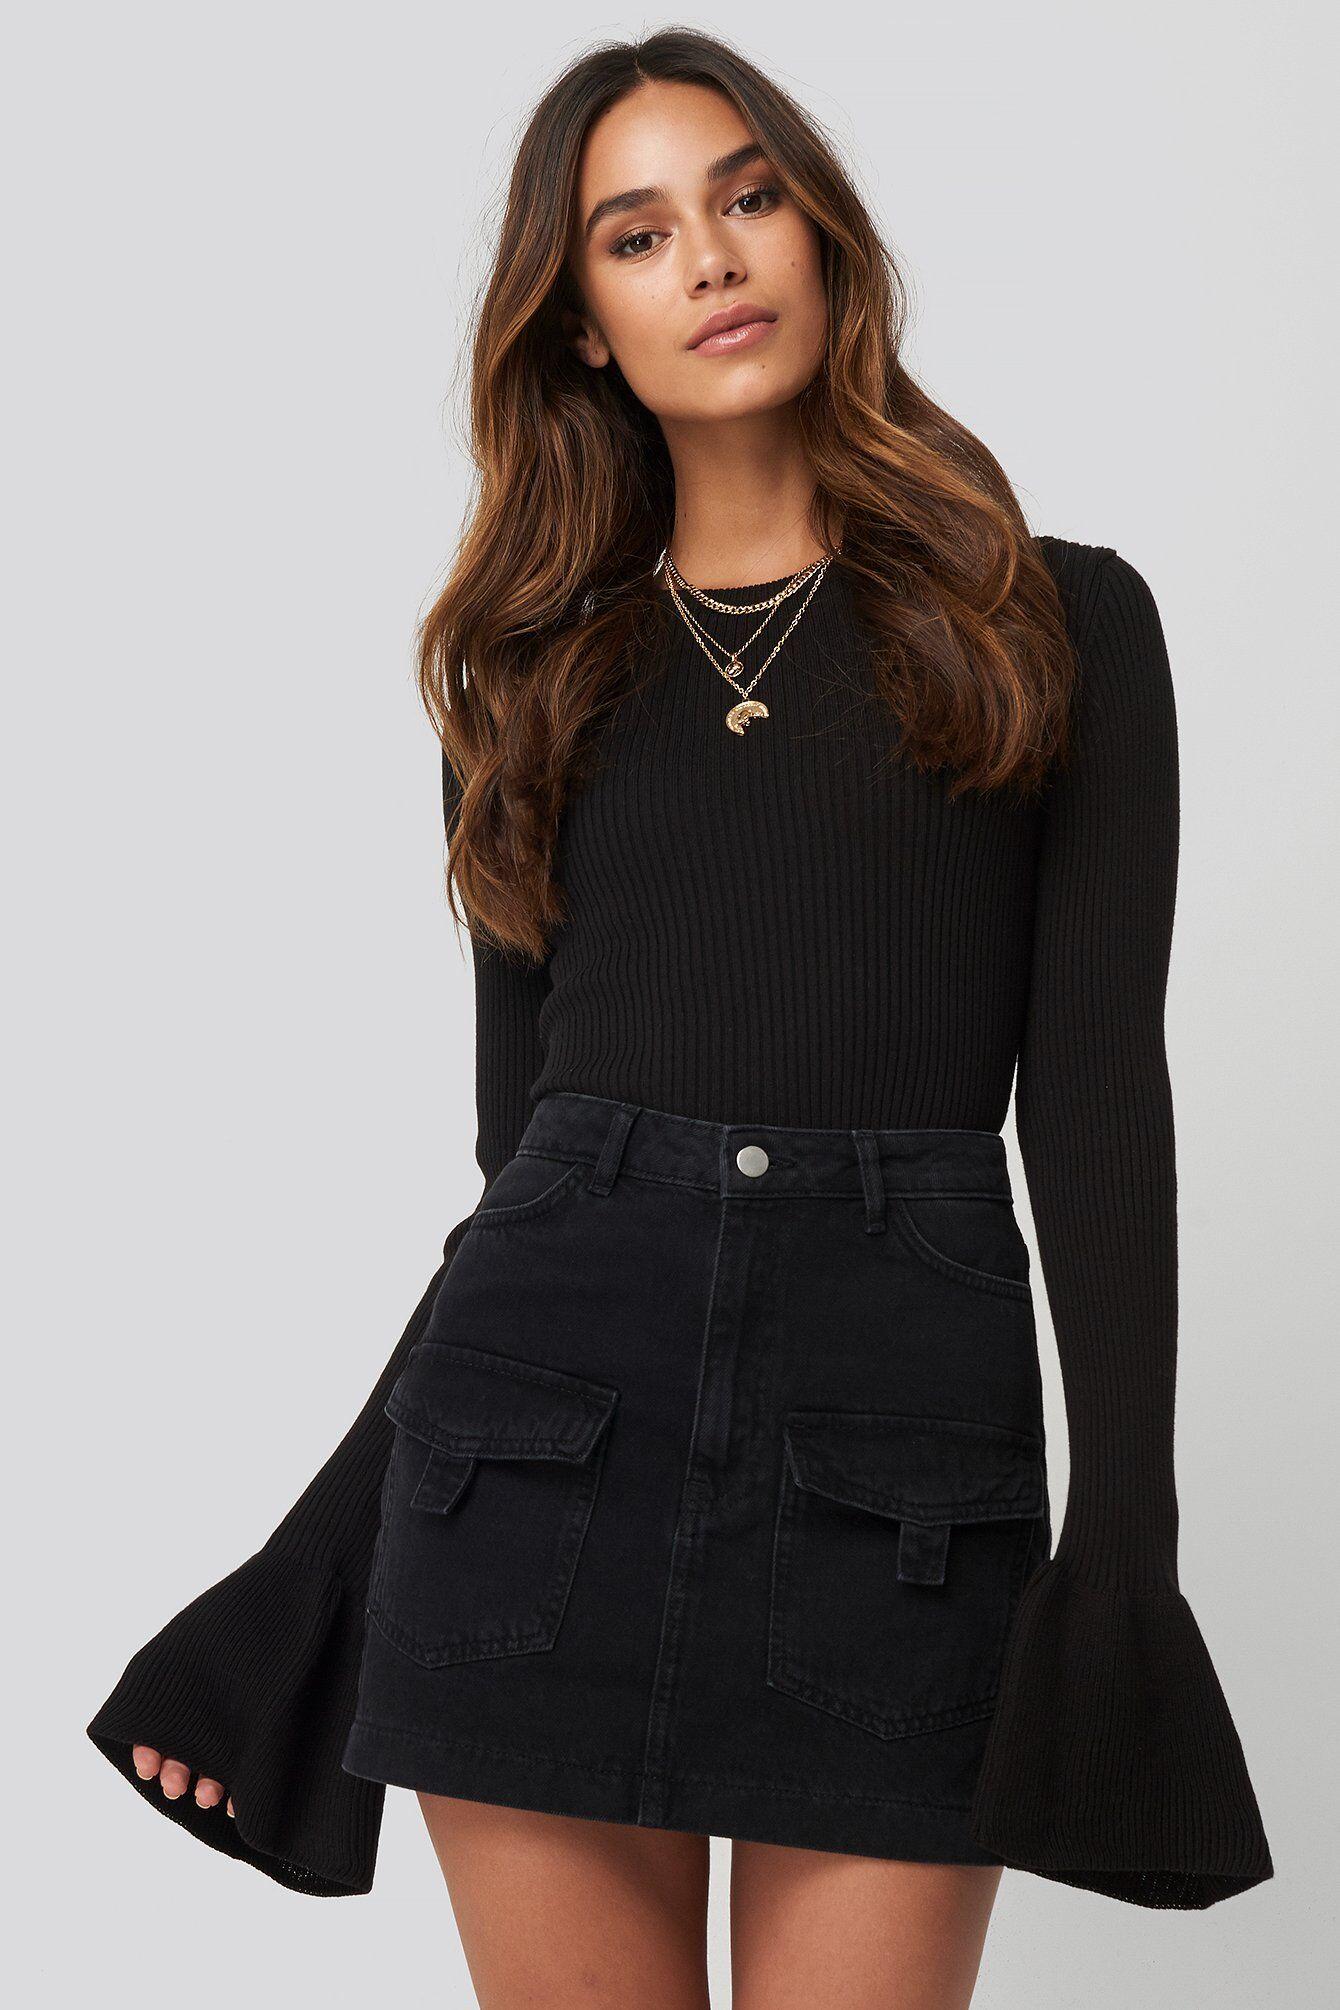 Queen of Jetlags x NA-KD Denim Cargo Skirt - Black